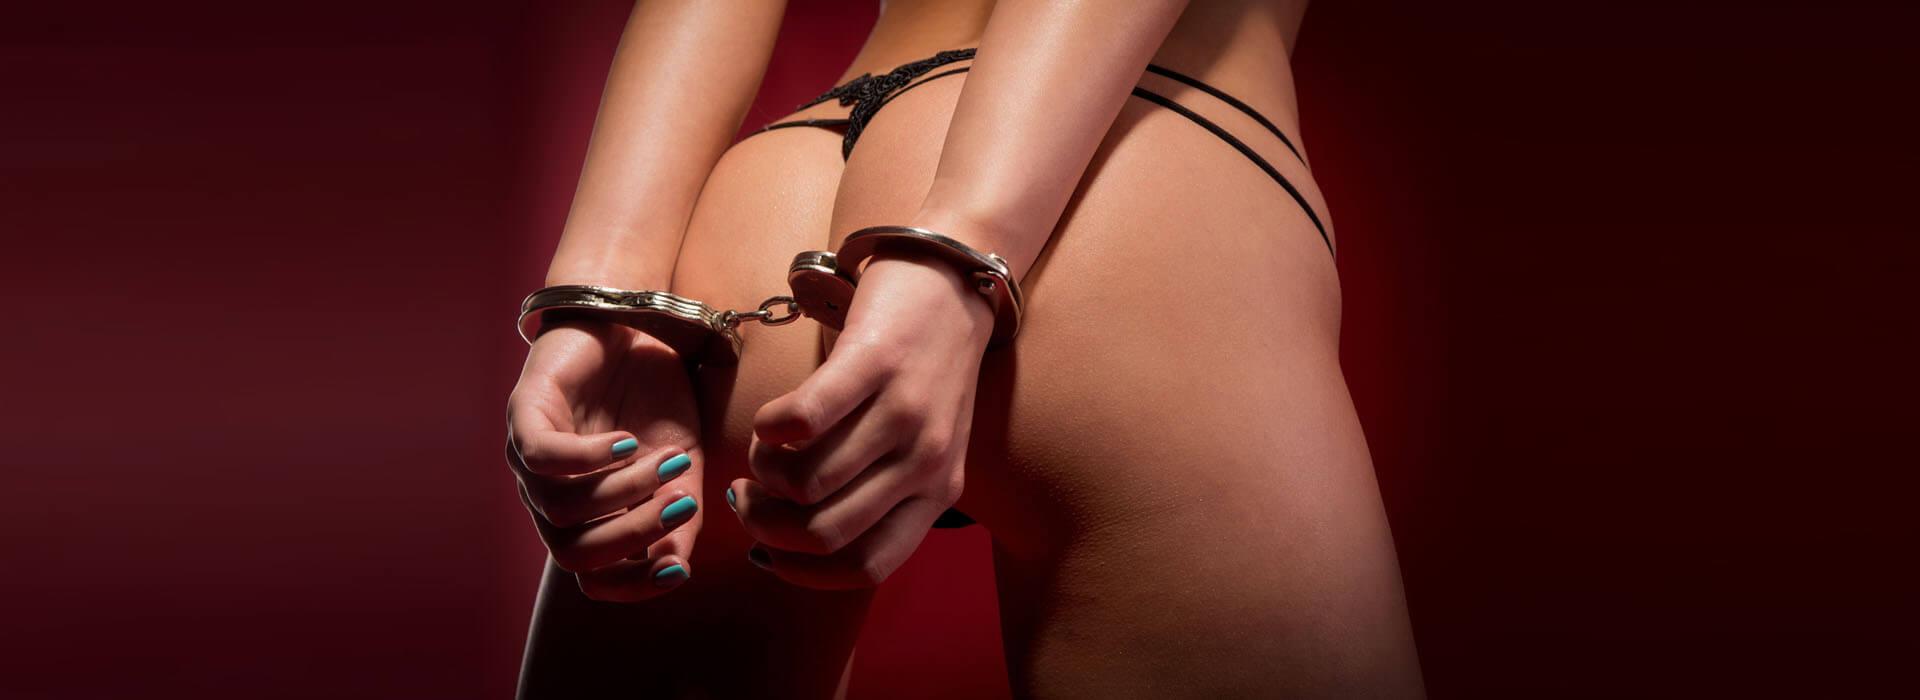 Bondage und BDSM